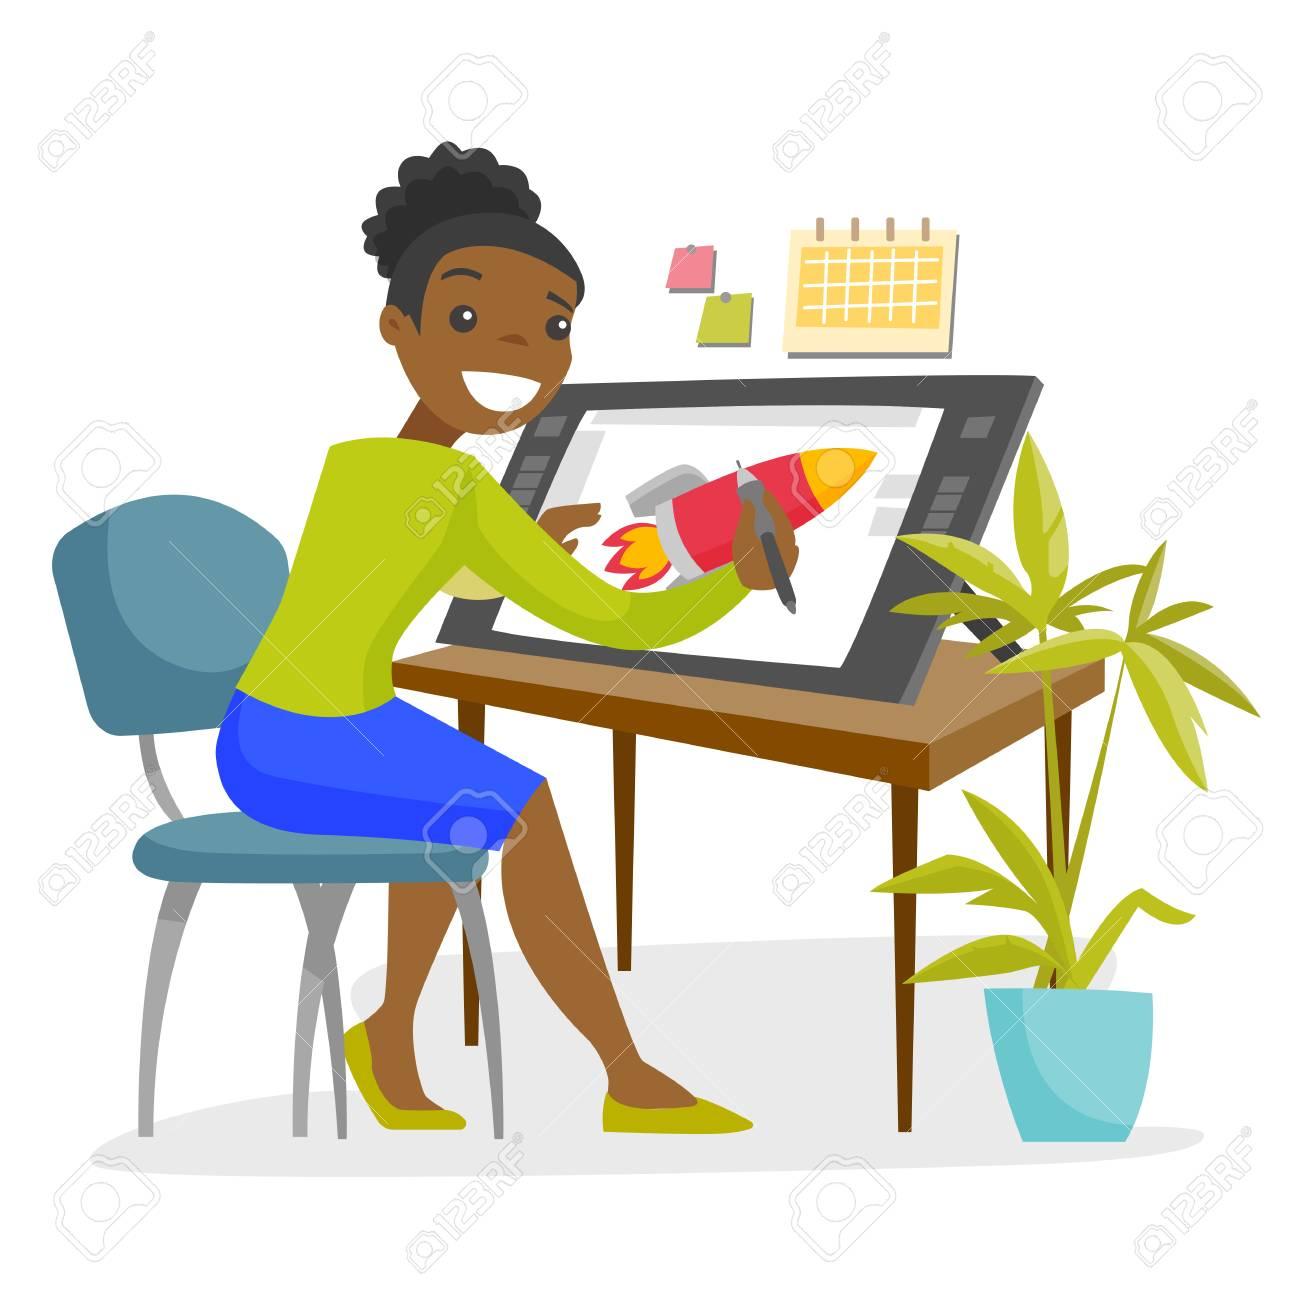 A Black Woman Graphic Designer Or Freelance Artist Works Using